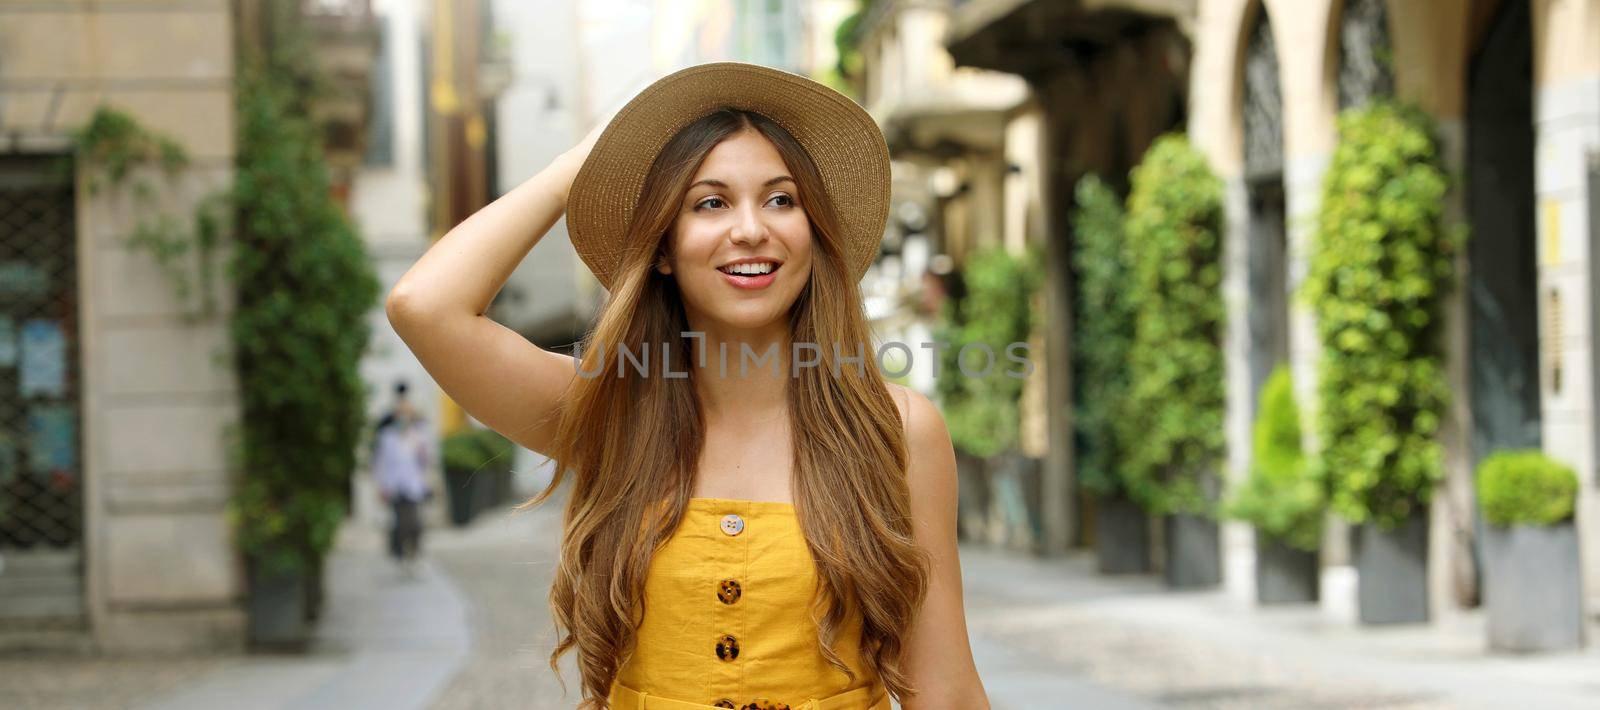 Portrait of fashion woman walking in Brera neighborhood in Milan, Italy. Banner view.